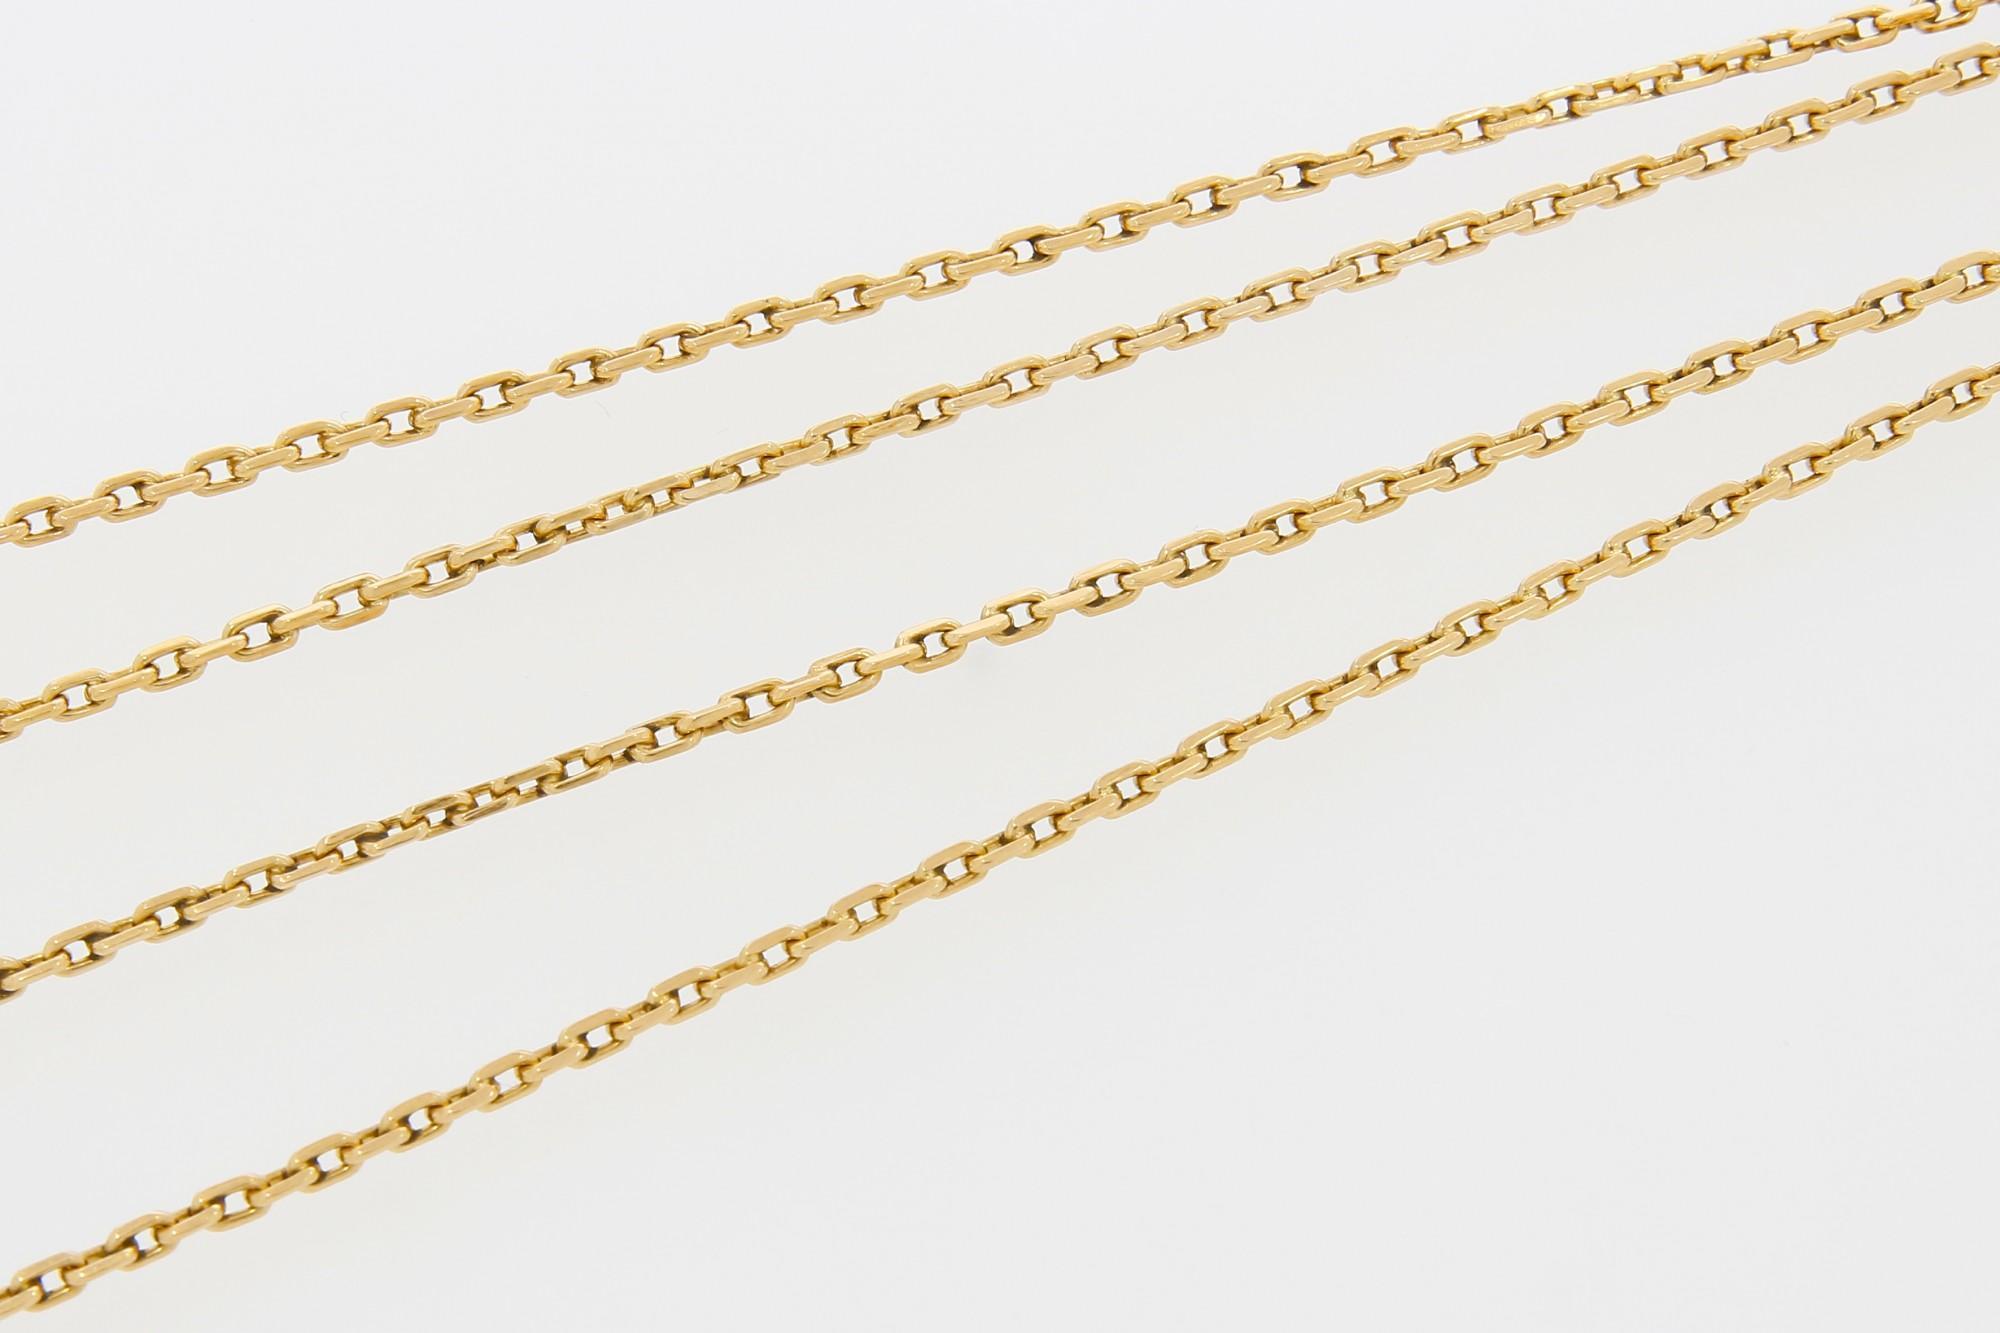 247f7a124bf Kuldkaelakett 585* Ankur - Luutar